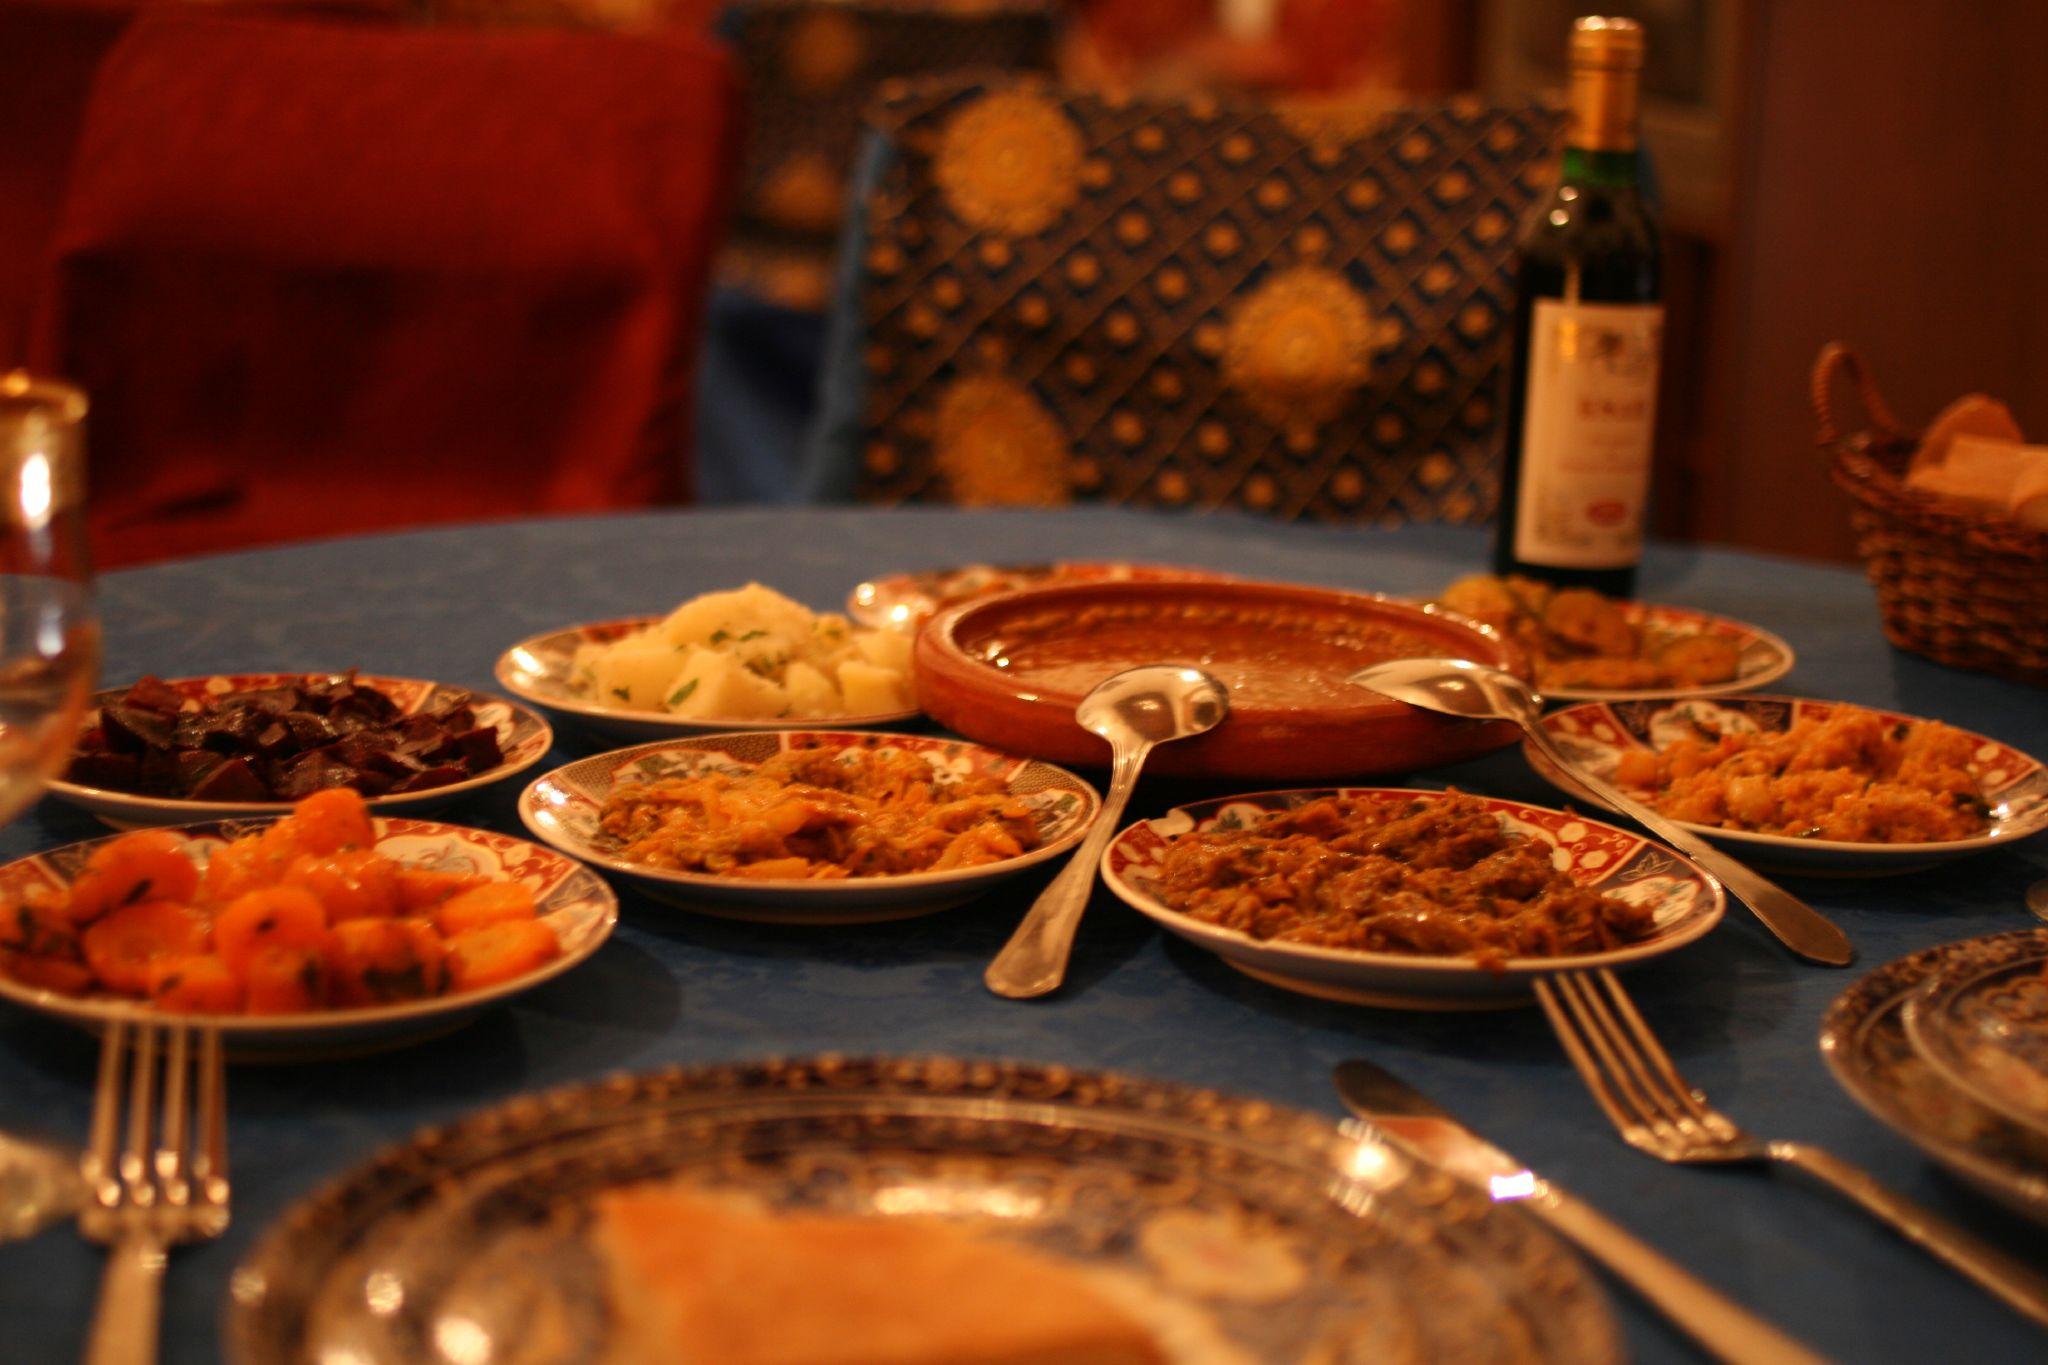 Morocco Street Food or Cafes  Restaurants  Africa